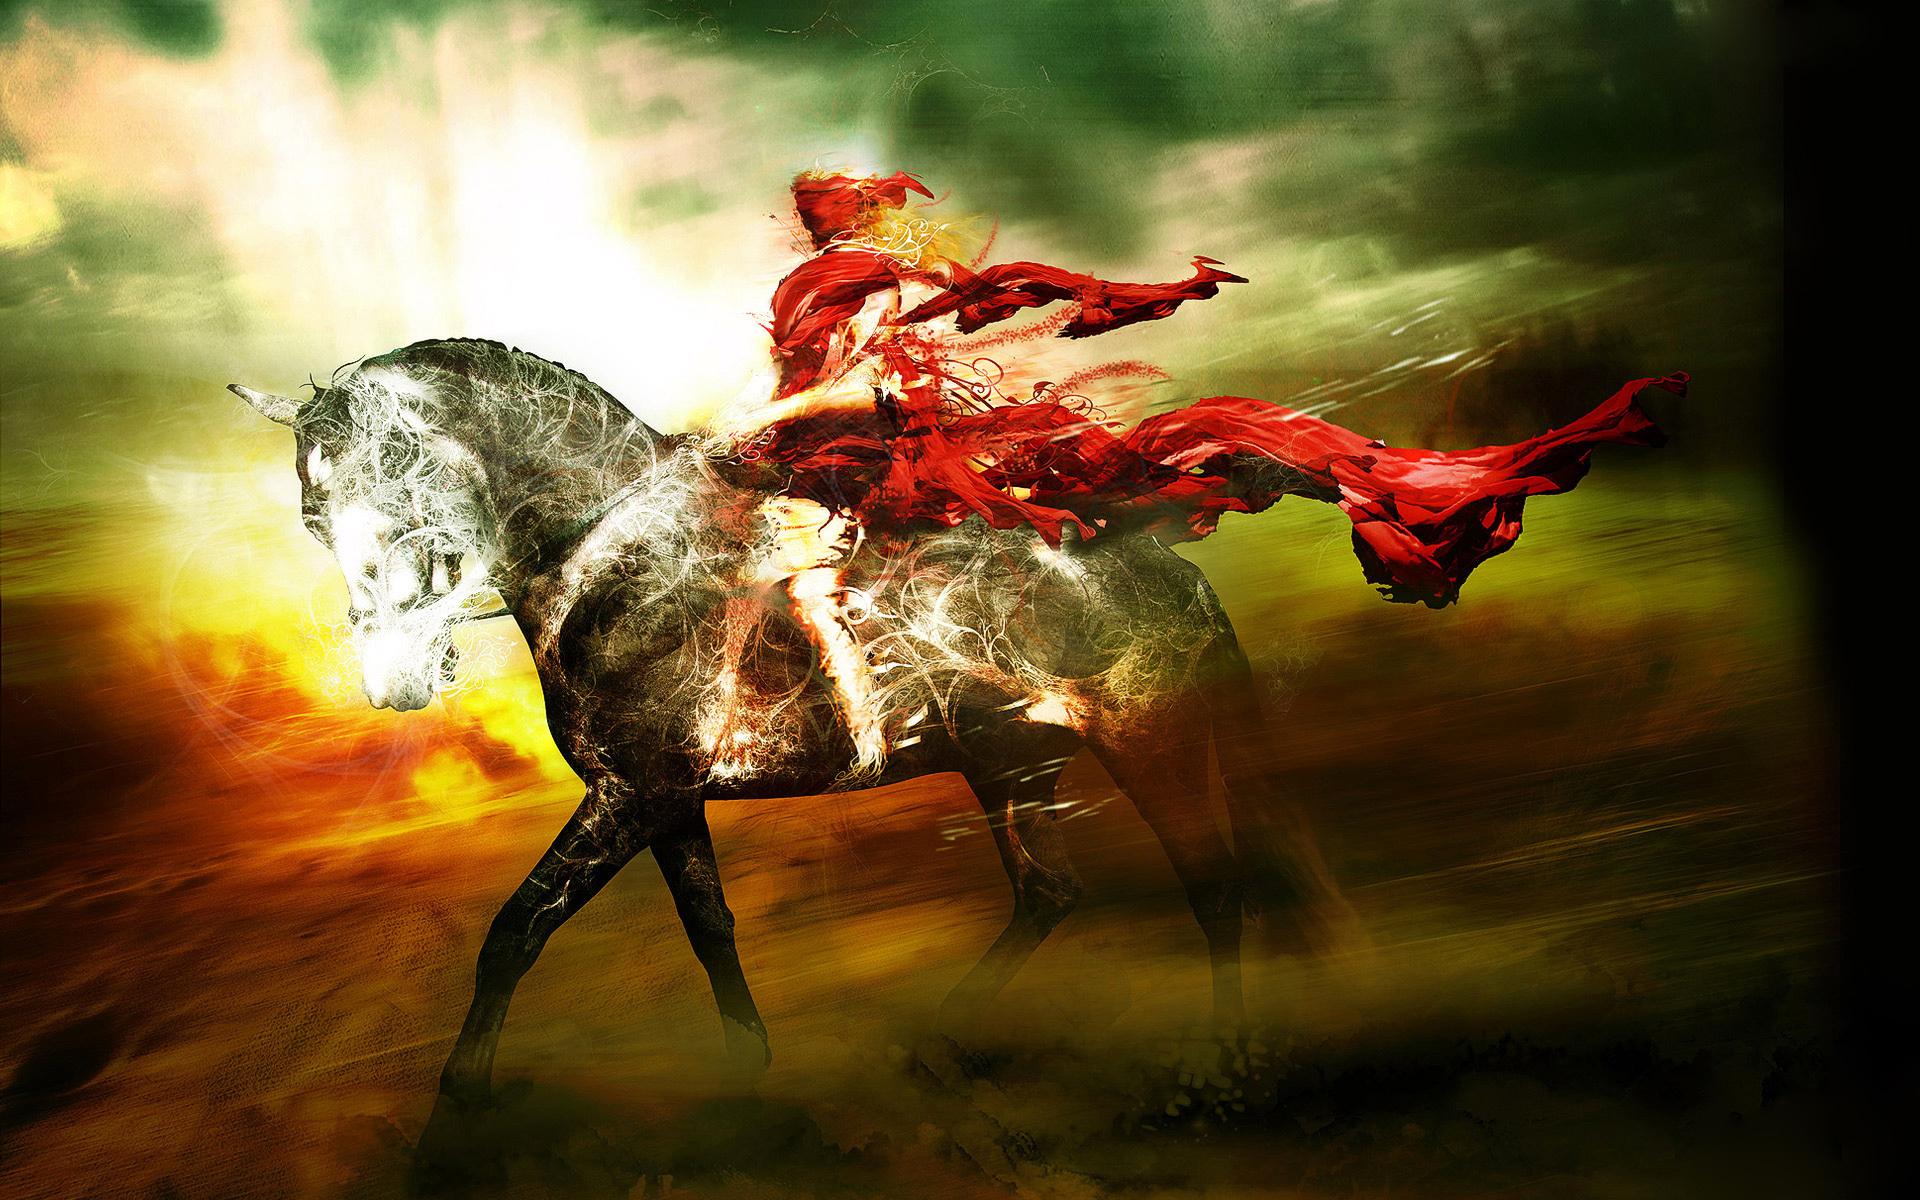 Horse rider wallpaper - photo#29